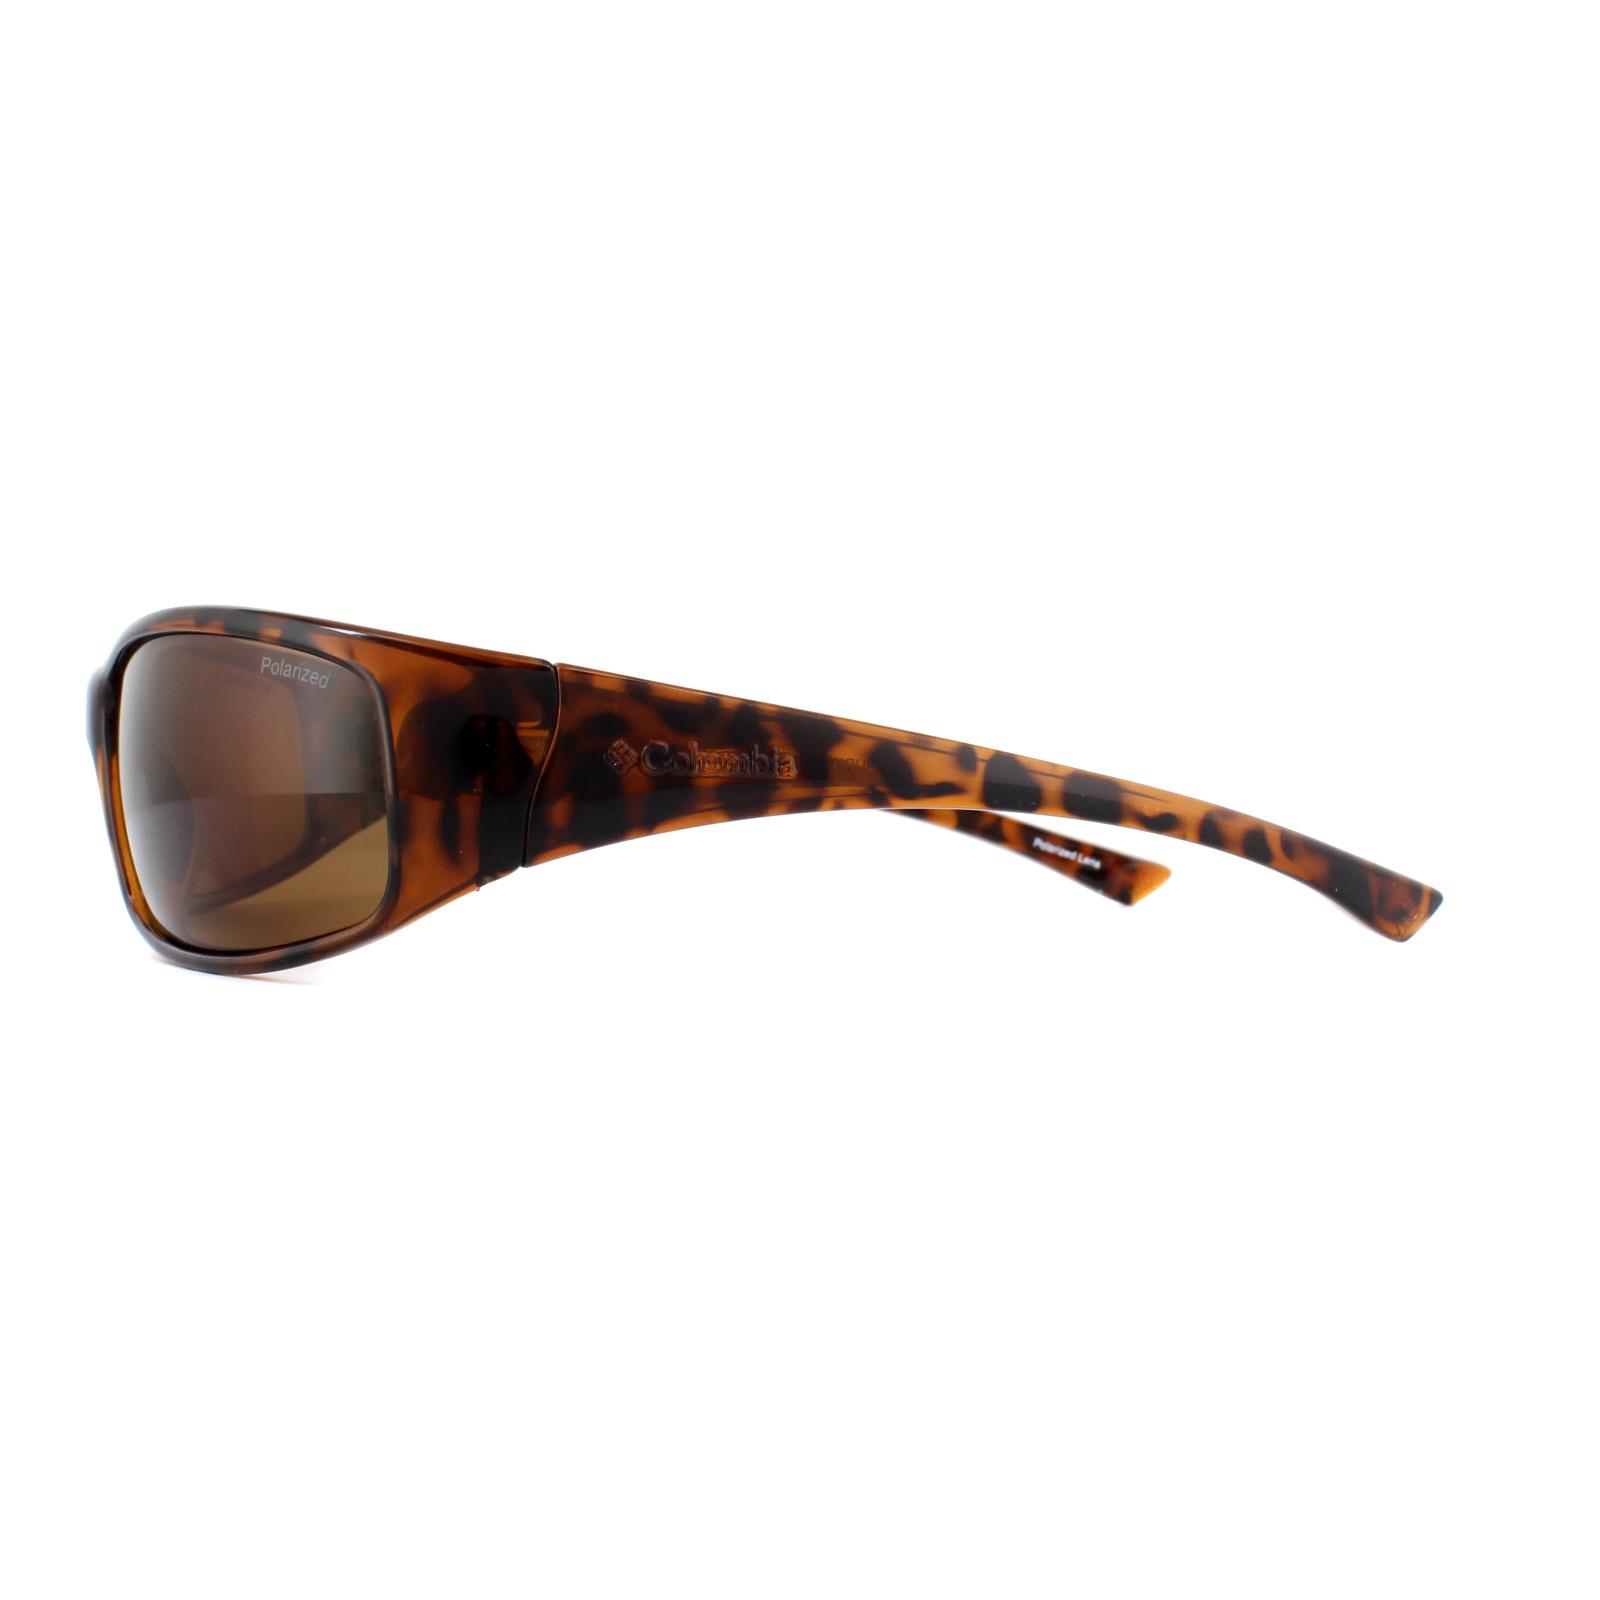 48f6ed3d79 Sentinel Columbia Sunglasses Auburn C620 Demi Tortoise Brown. Sentinel  Thumbnail 3